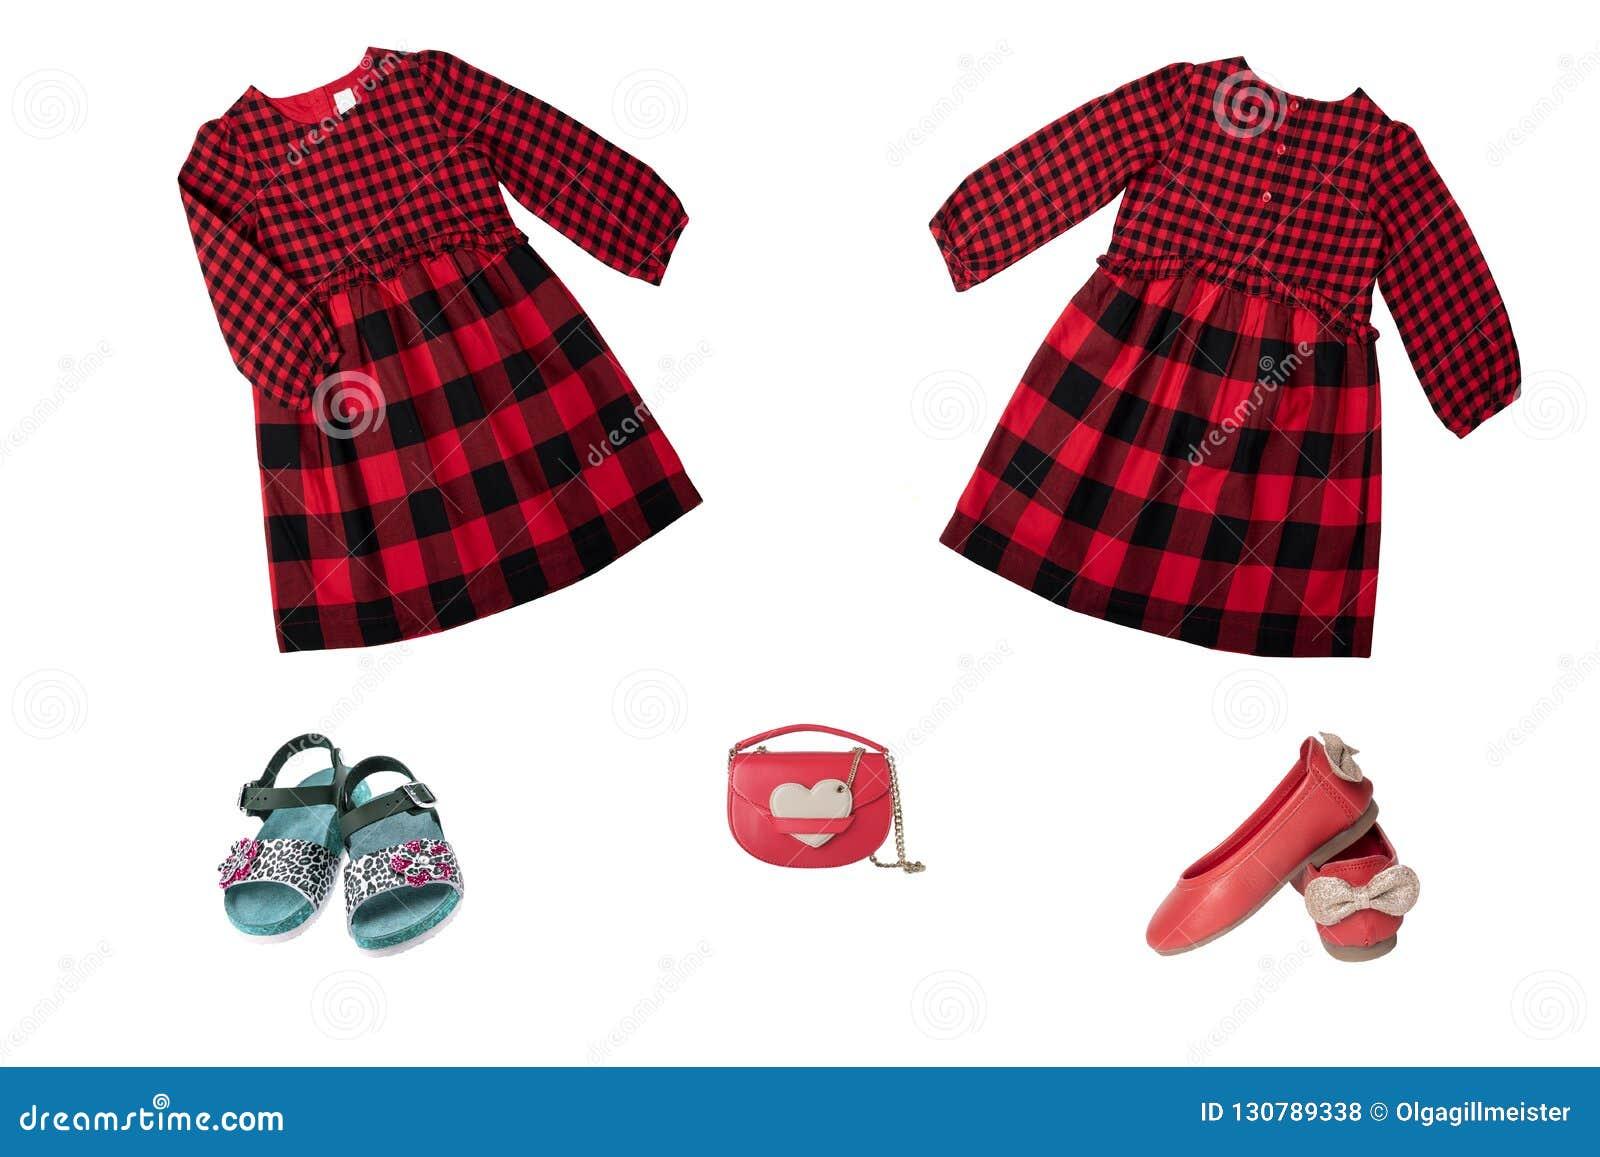 Schuhe | kaenguru kinderkleidung